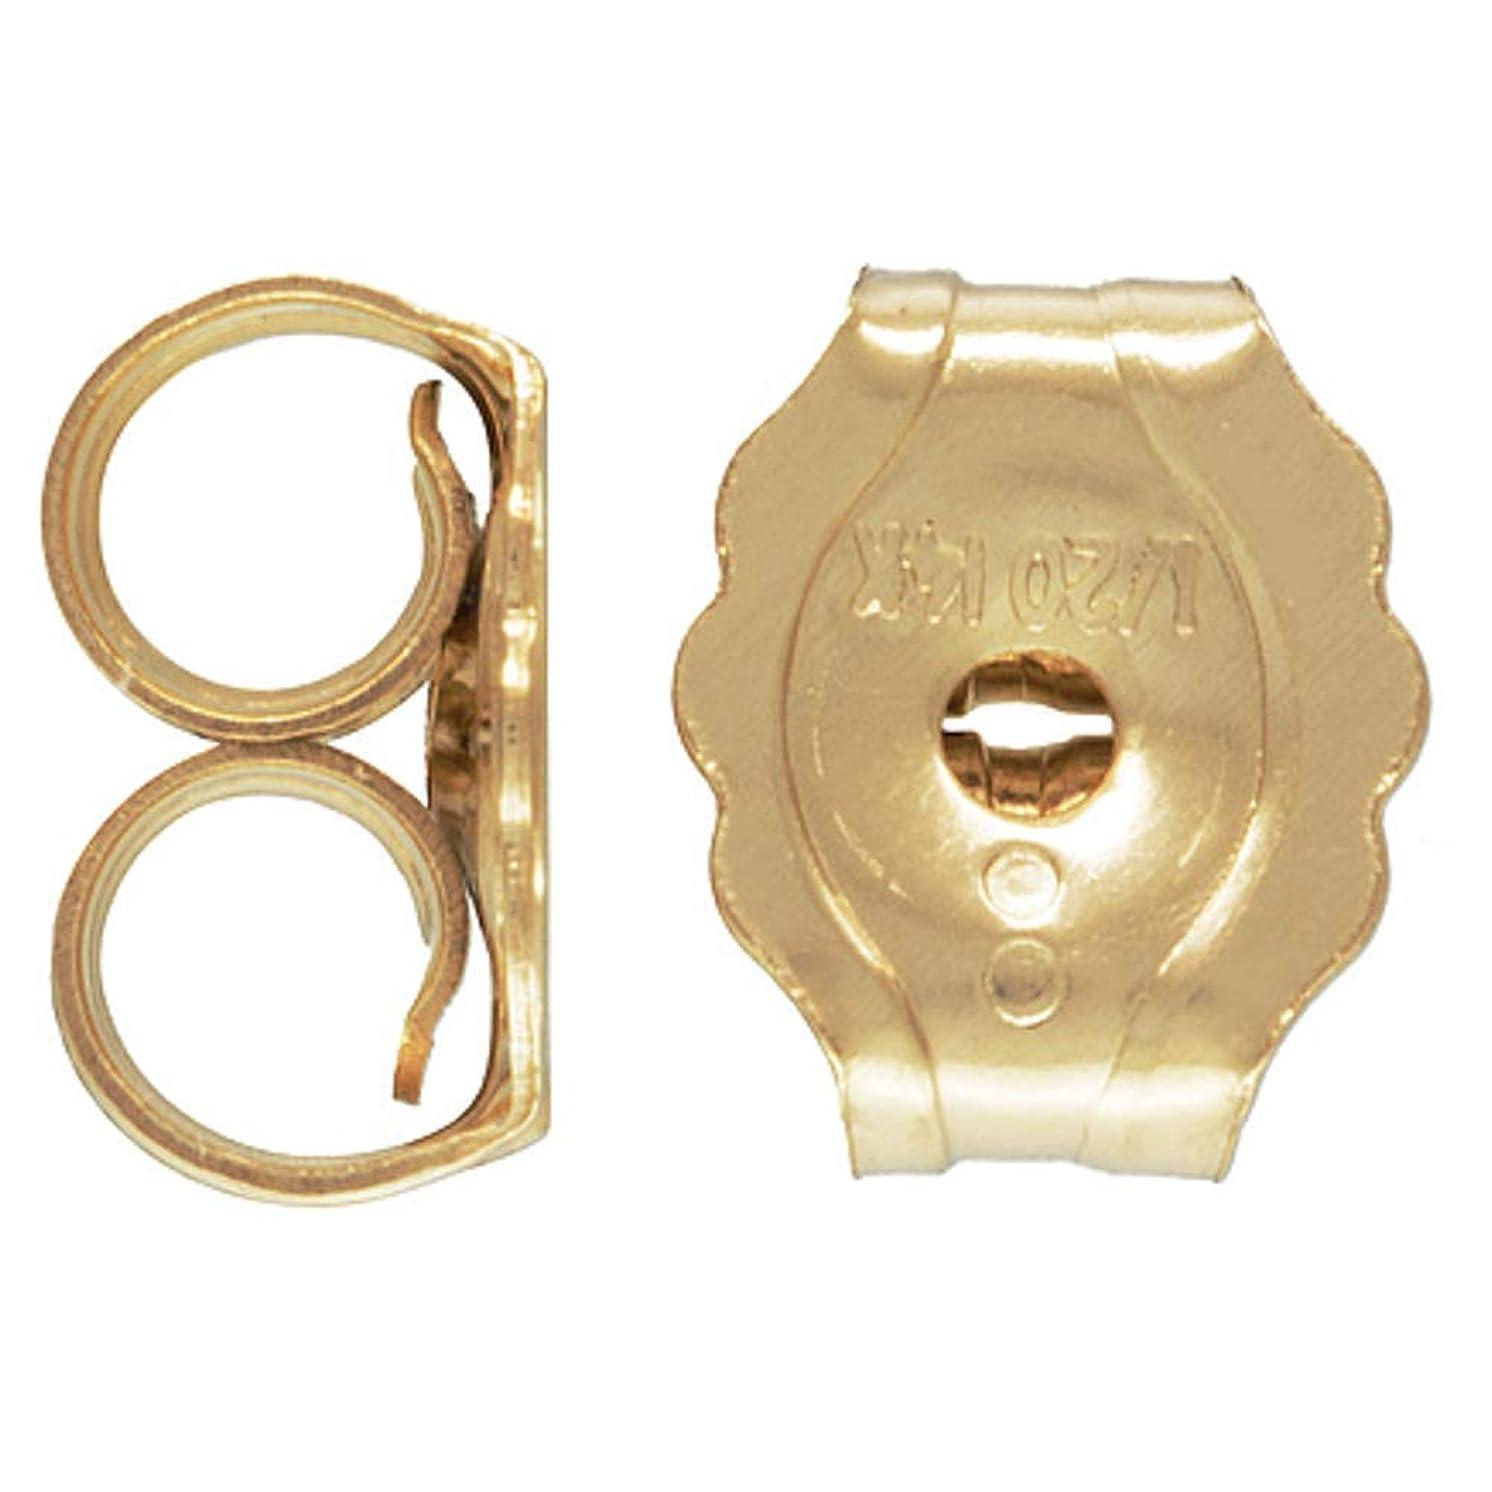 JensFindings 50 Qty. 14k Gold Filled Earring Backs, Light & Small (4.6x3.8mm